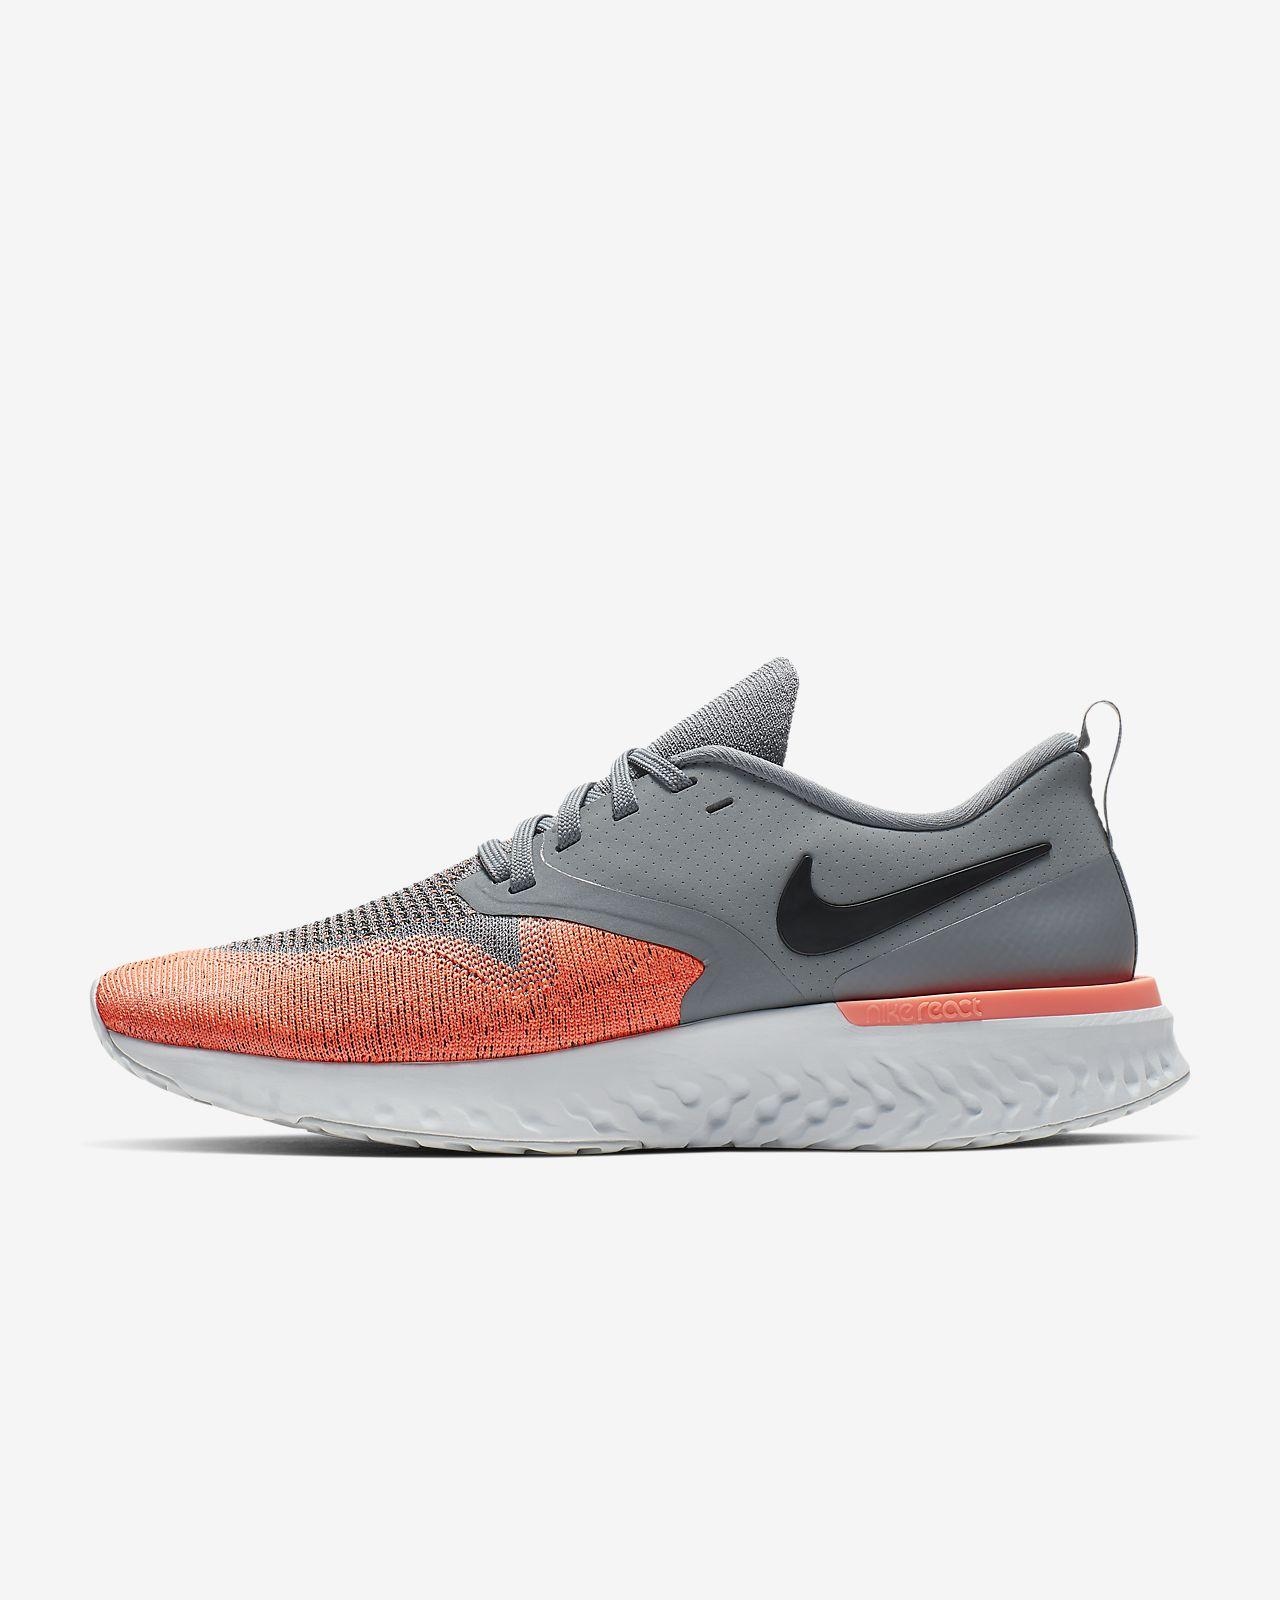 Nike Odyssey React Flyknit 2 løbesko til kvinder